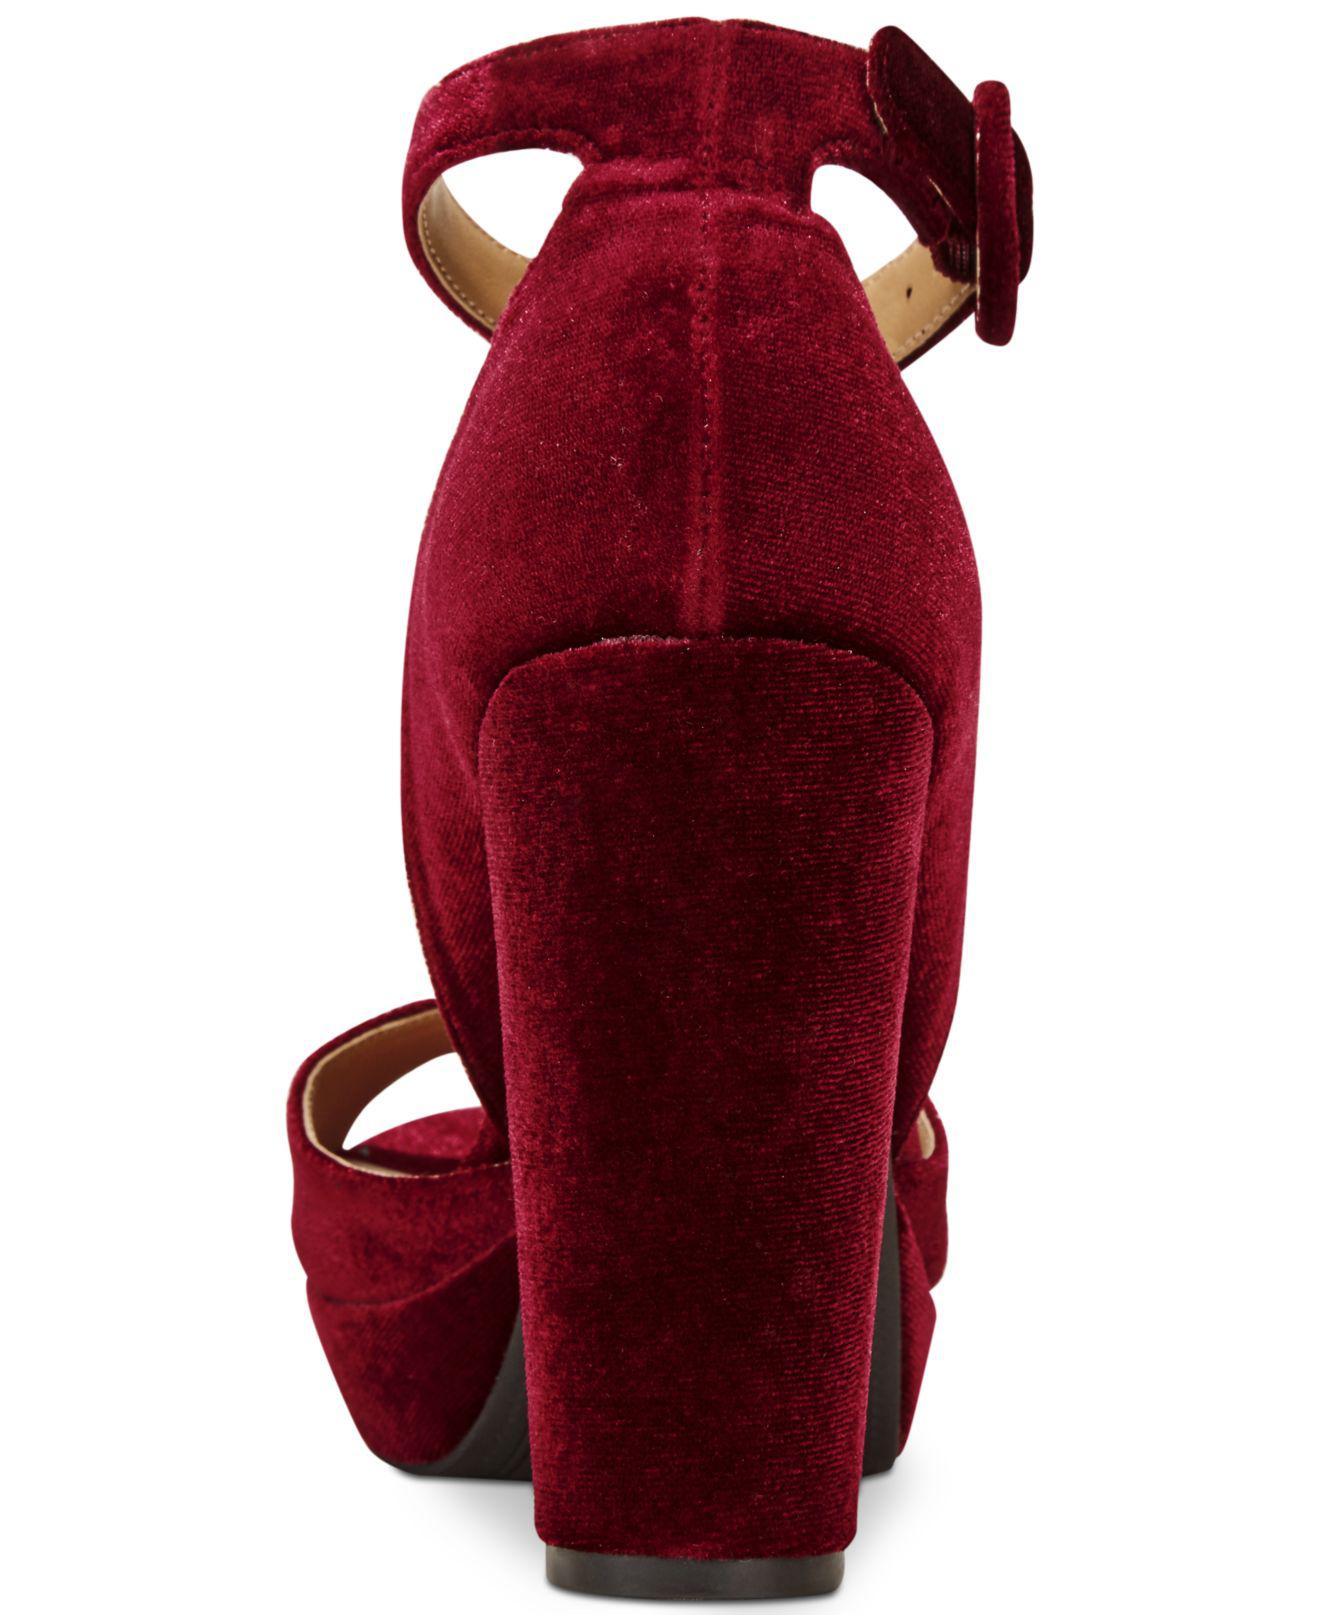 b8642c49bf American Rag Reeta Block-heel Platform Sandals, Only At Macy's in ...